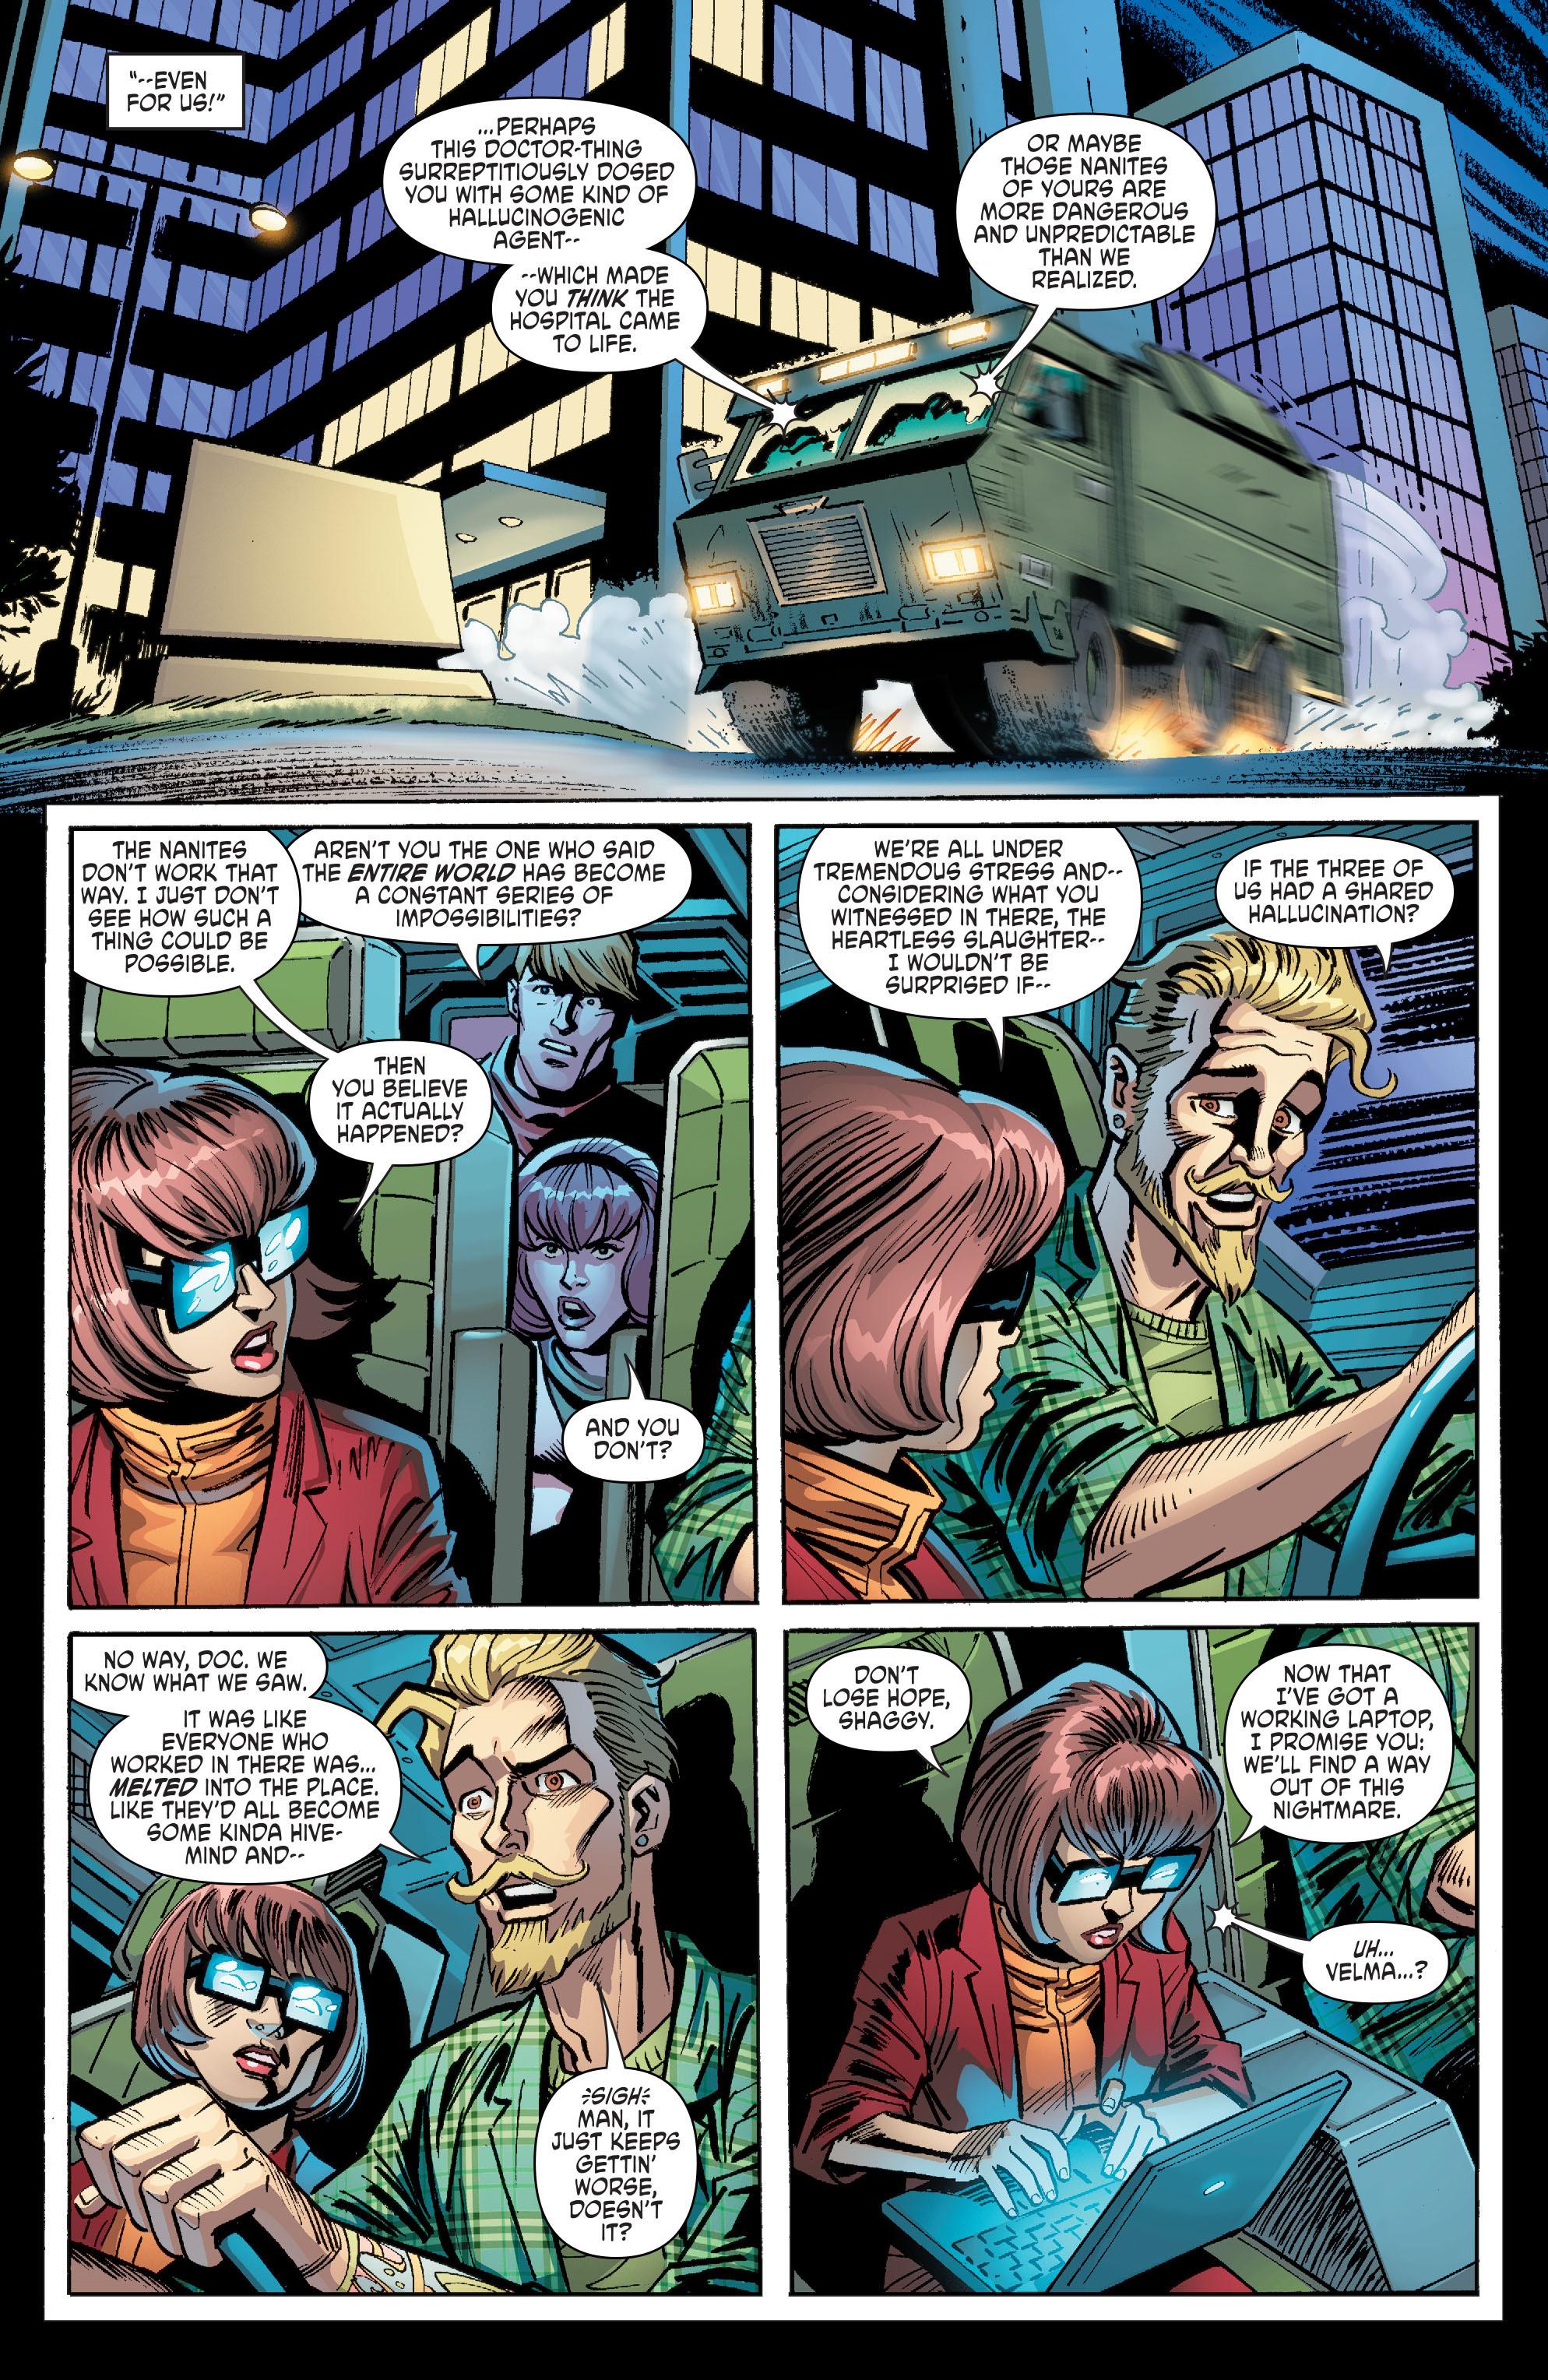 Read online Scooby Apocalypse comic -  Issue #8 - 24